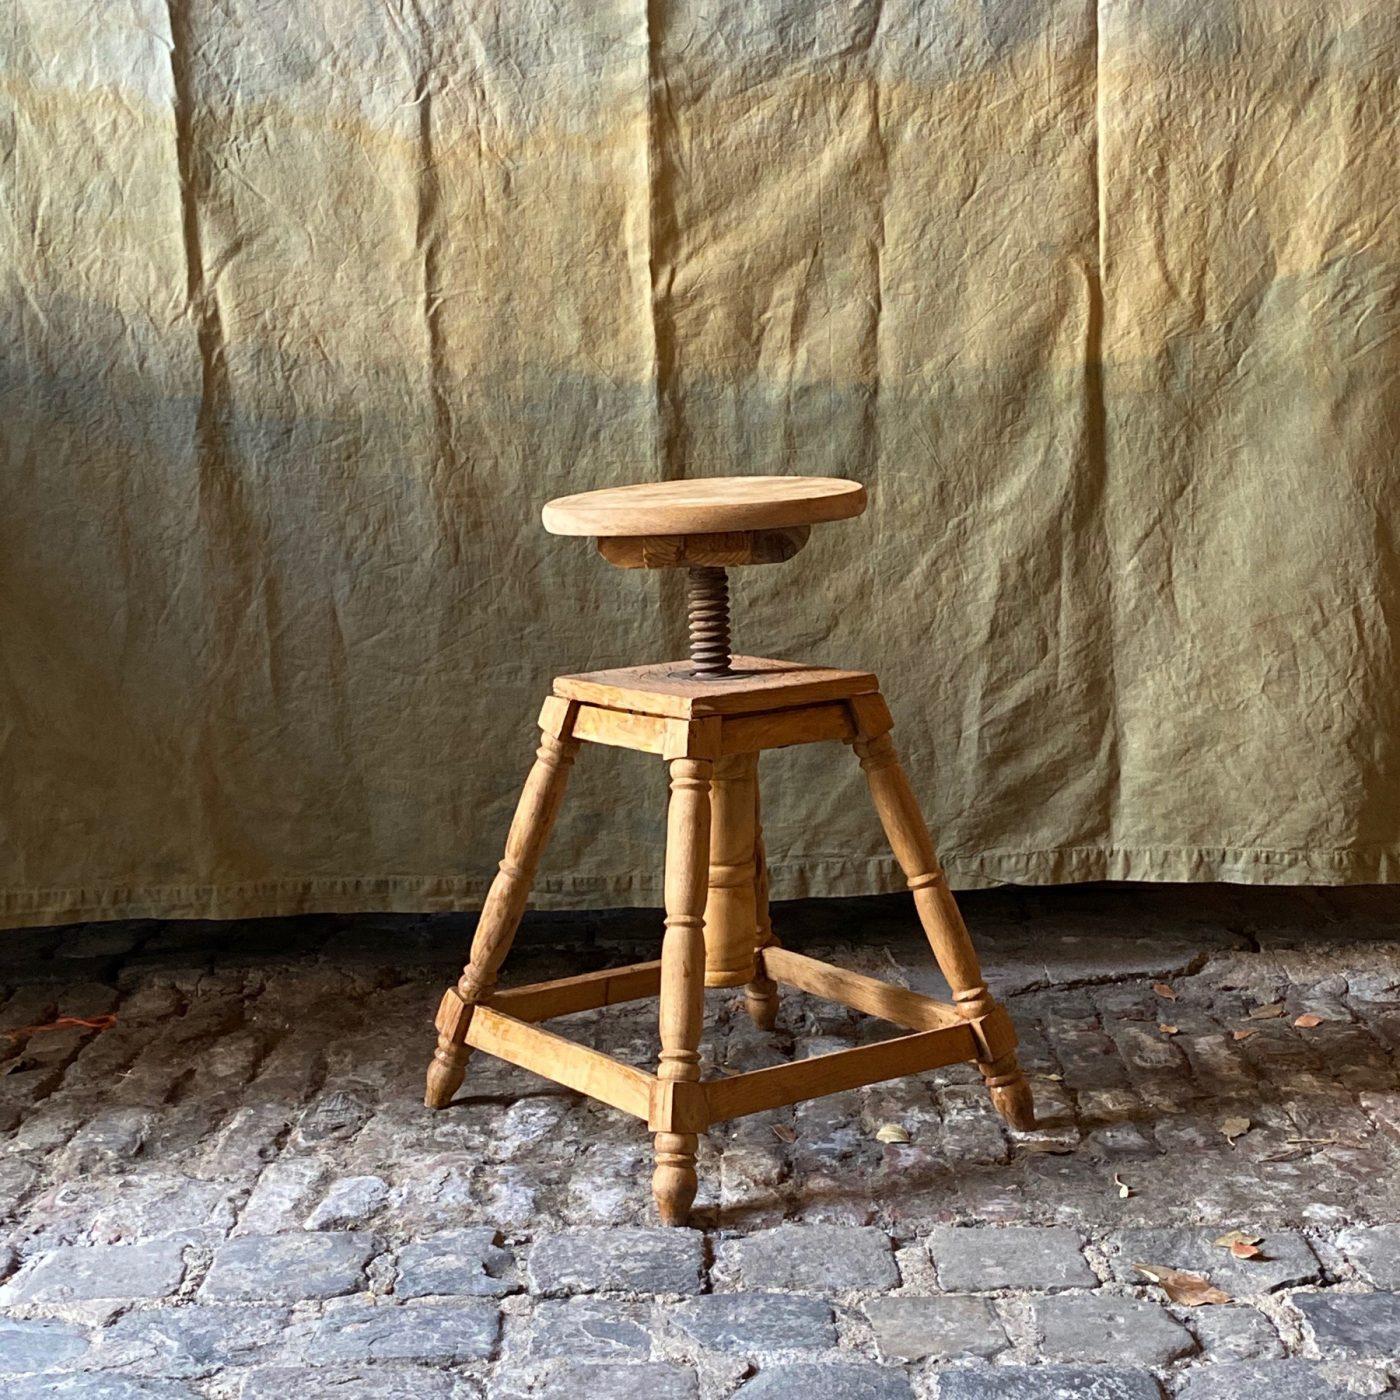 artist-stool0001